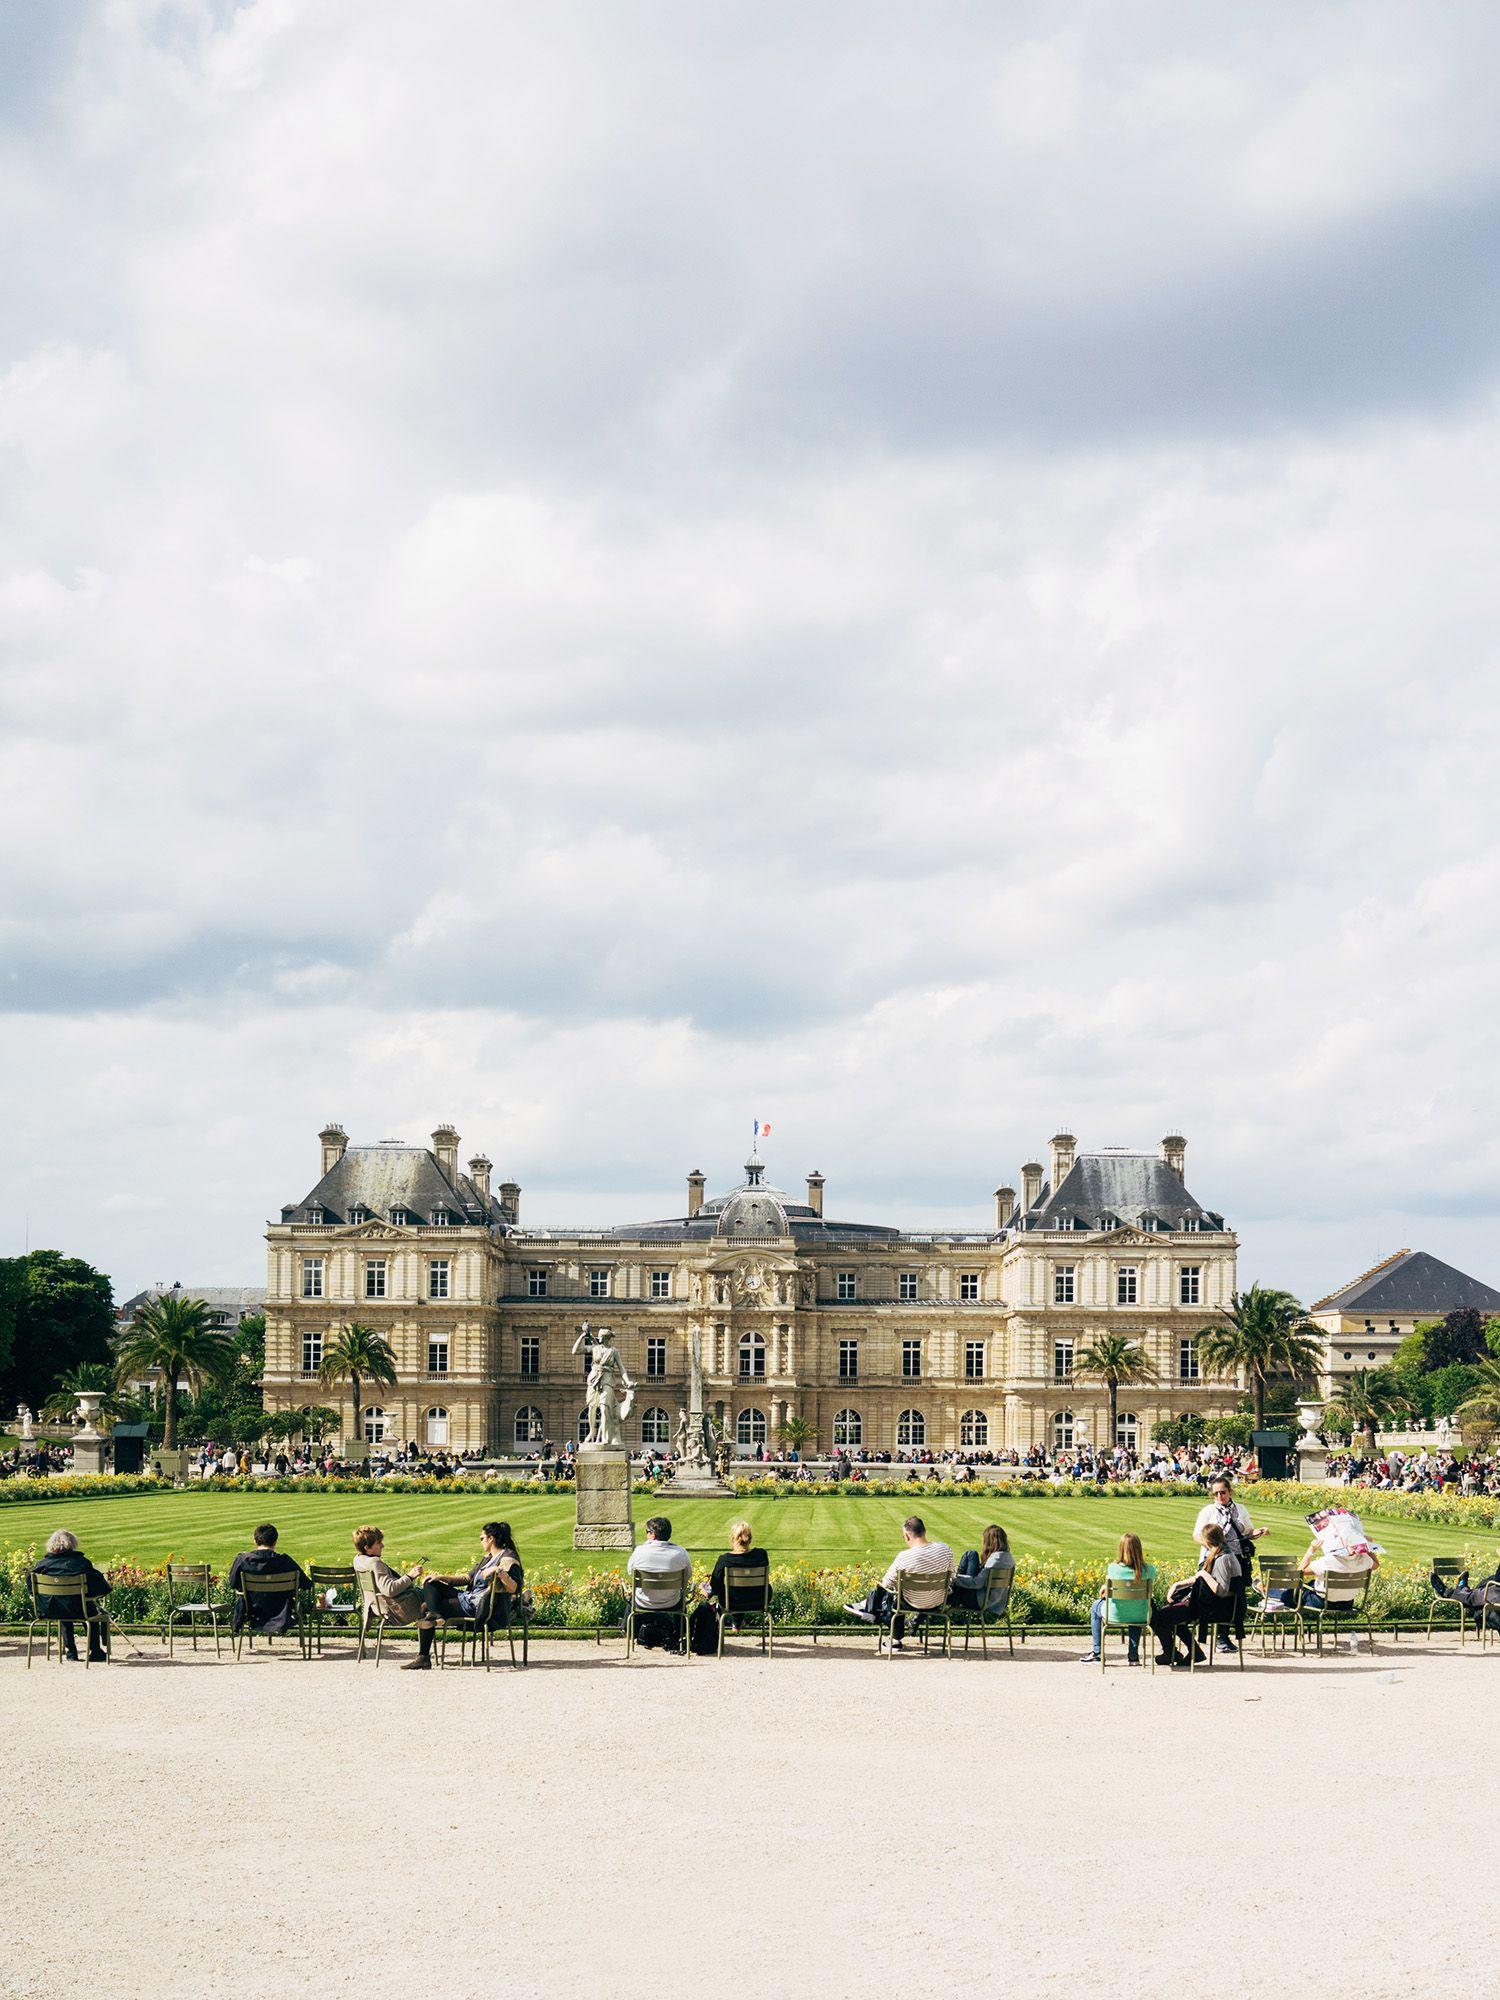 Jardin Du Louvre Luxe Paris the Jardin Du Luxembourg is One Of the Best Places